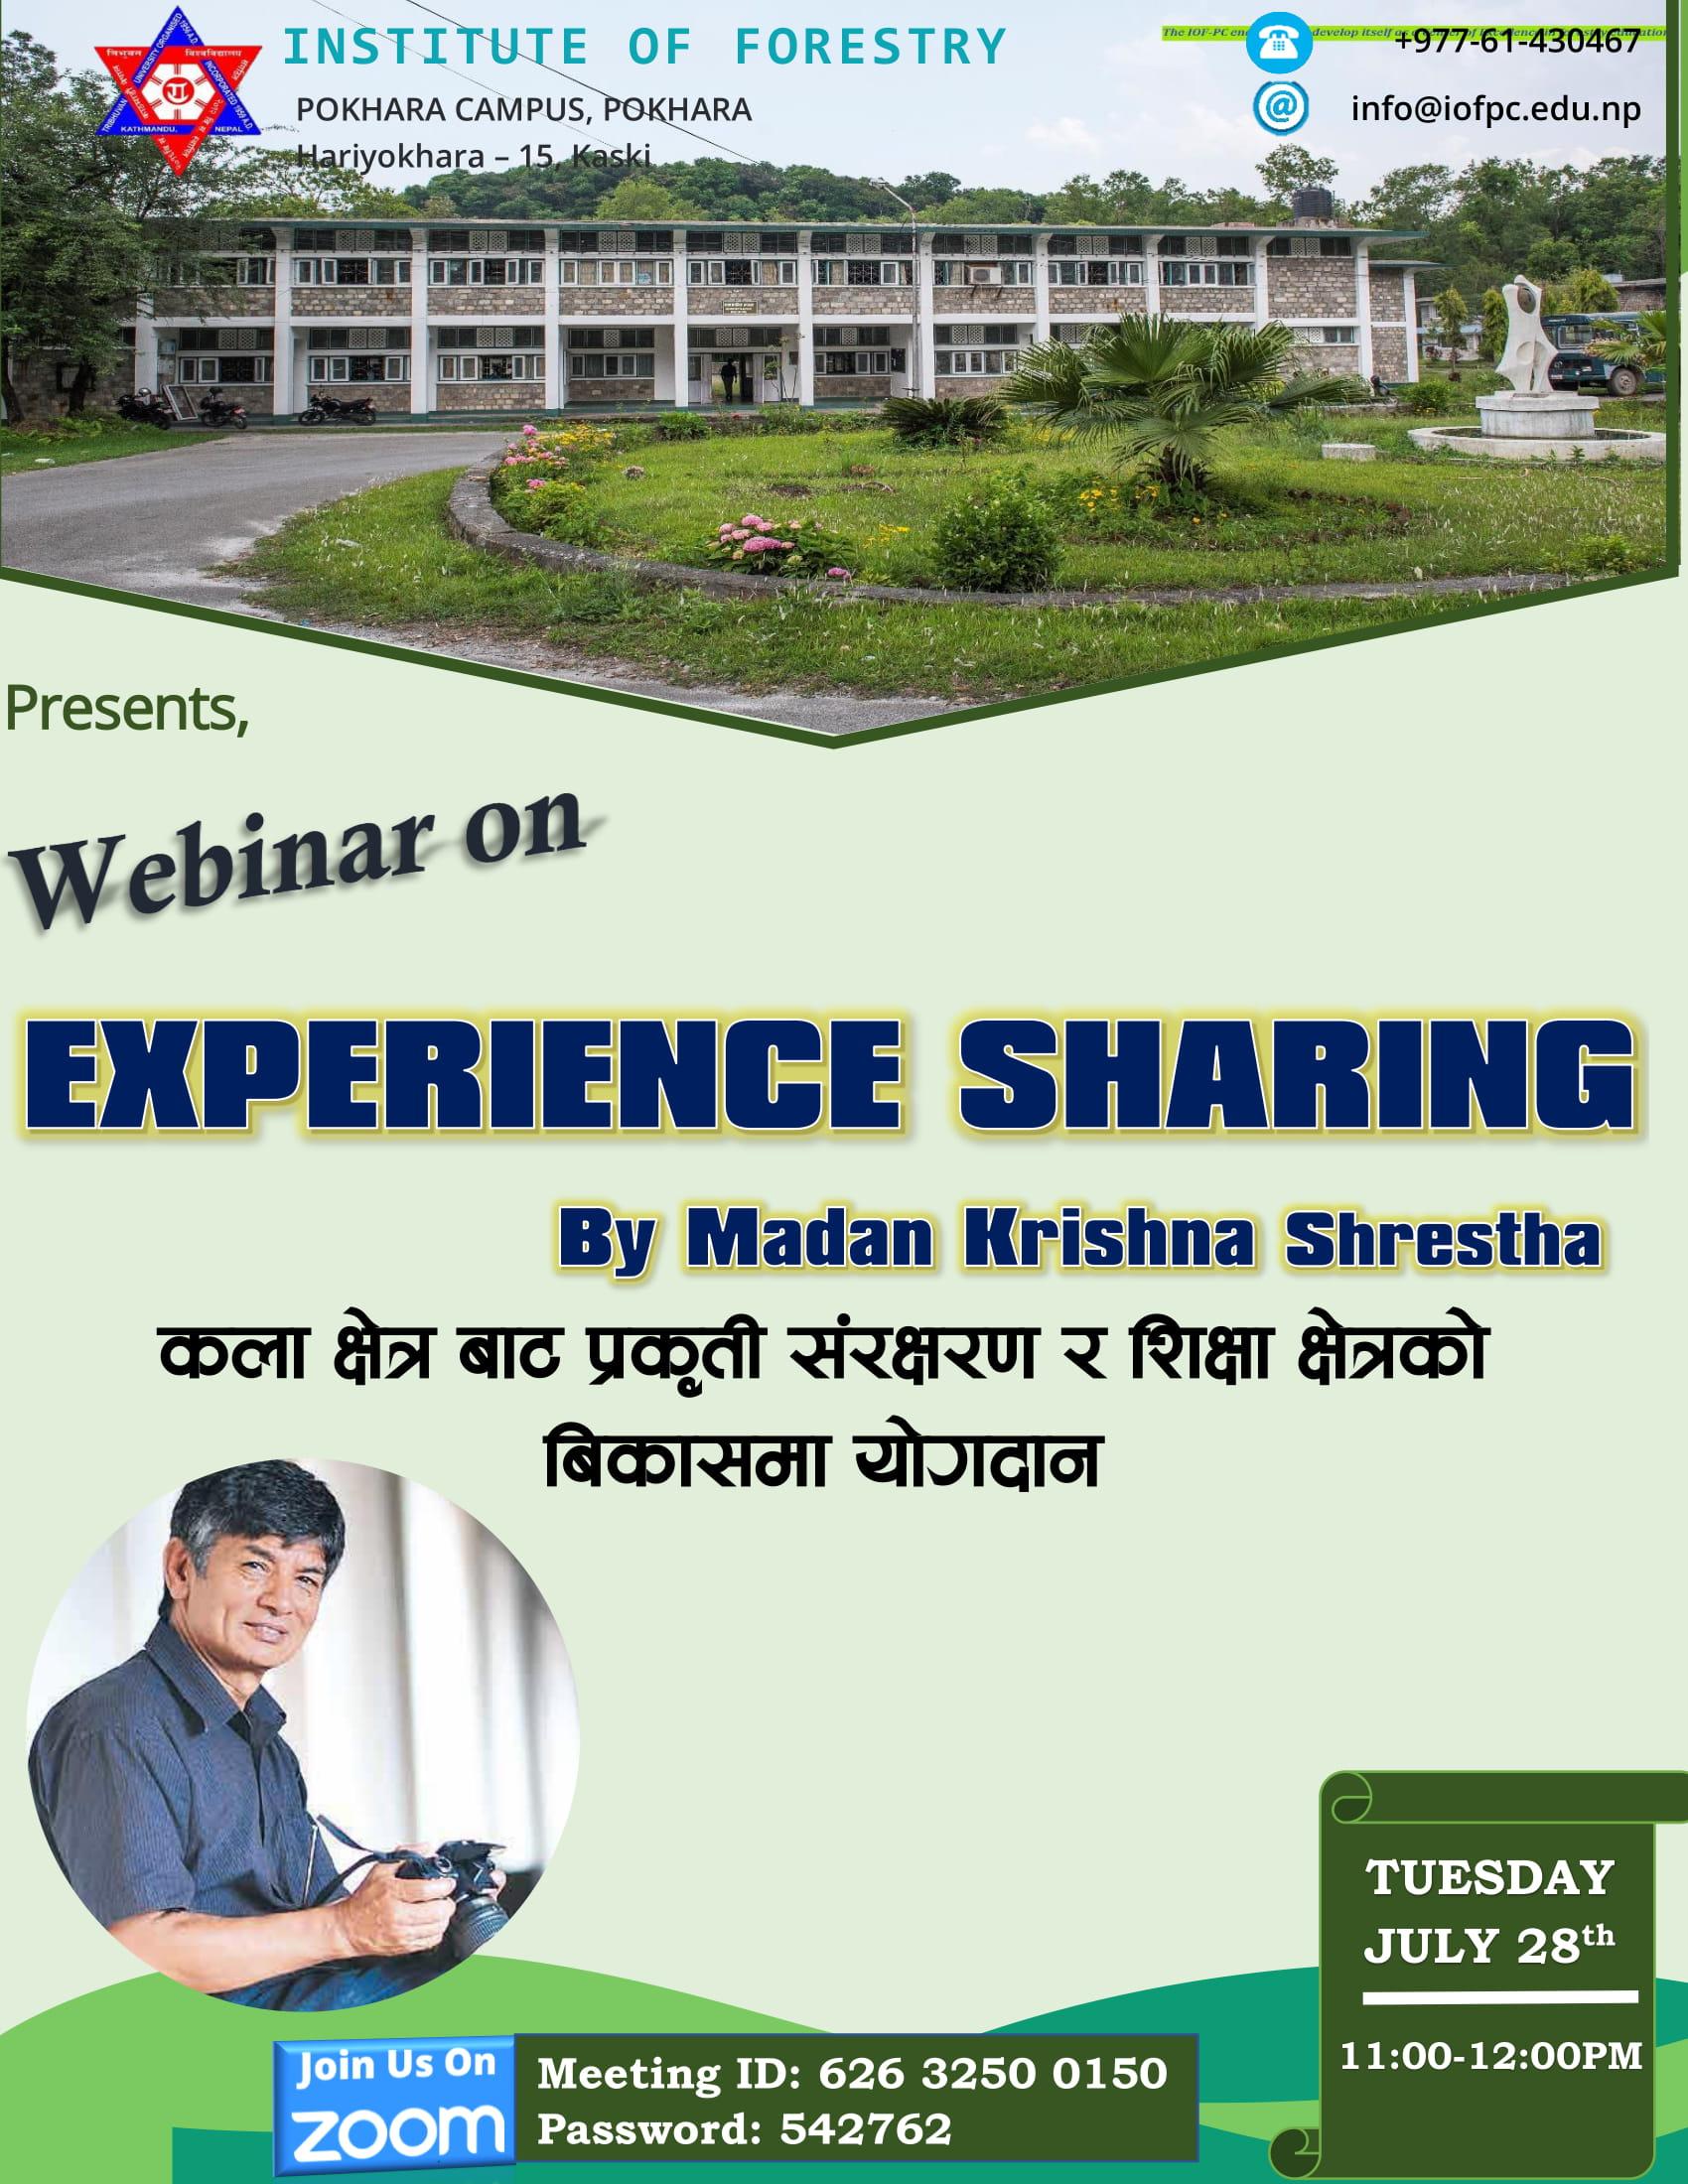 Experience-Sharing-by-Madan-Krishna-Shrestha